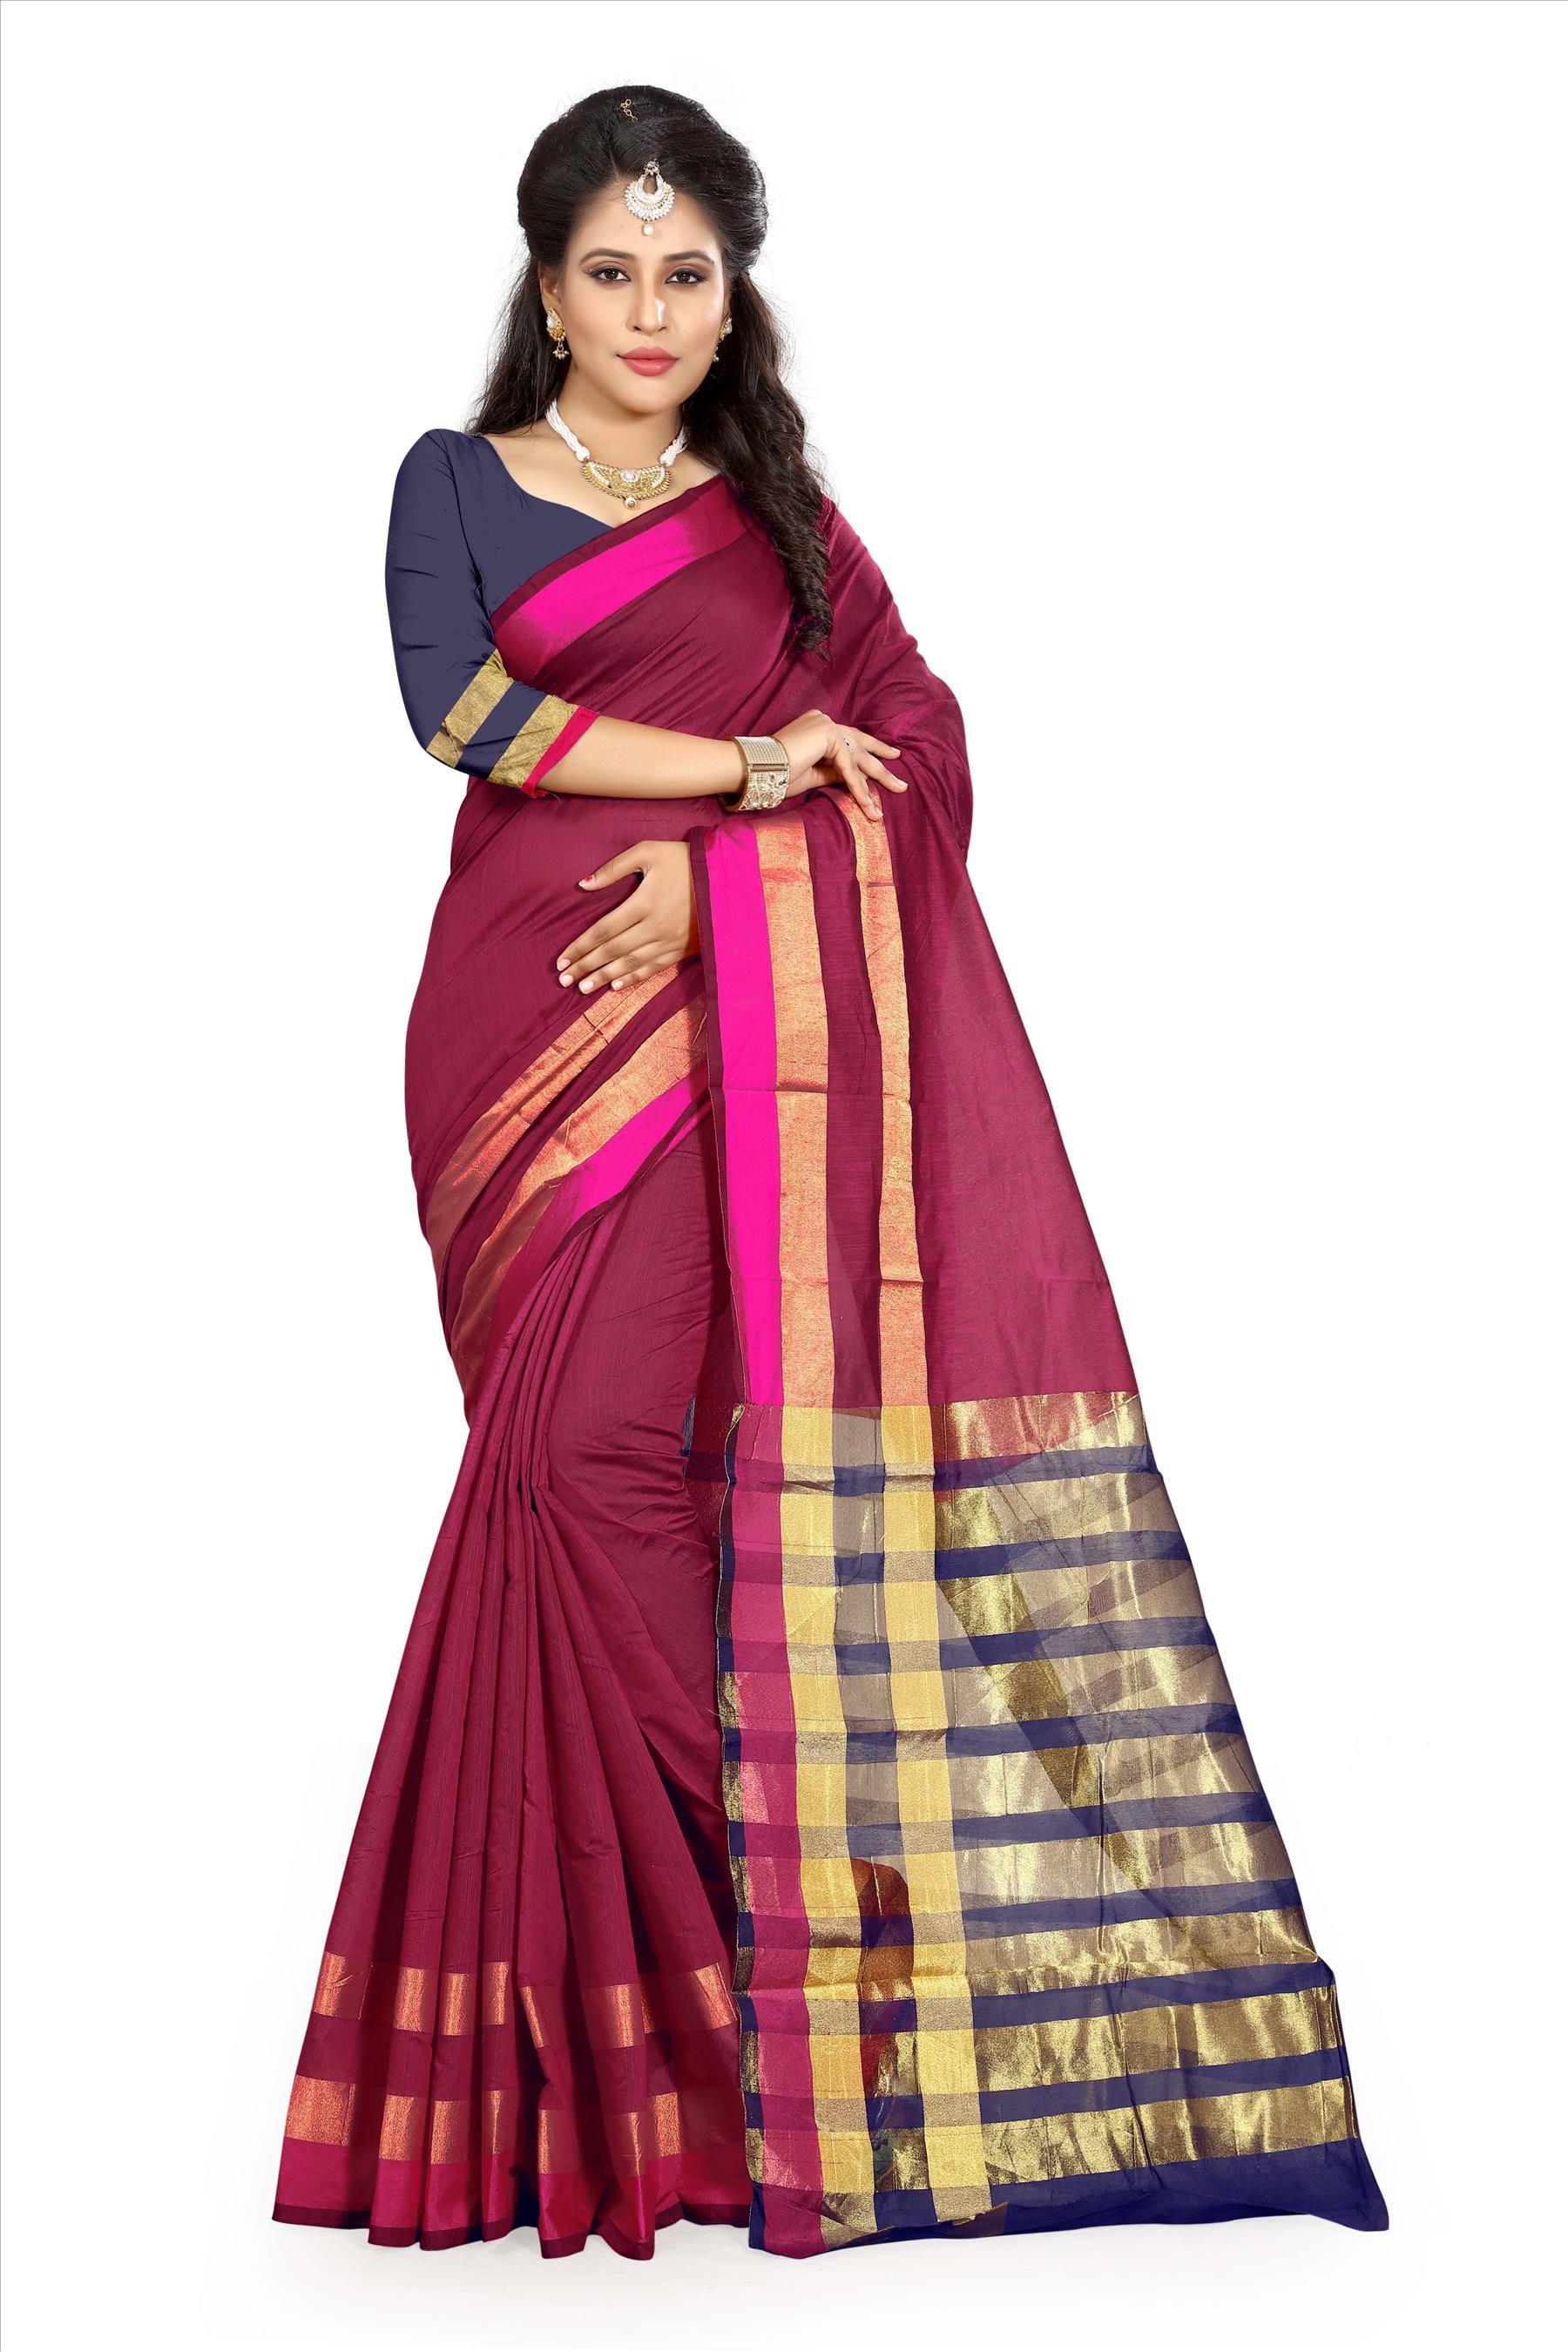 Urban India Red and Maroon Cotton Silk Saree